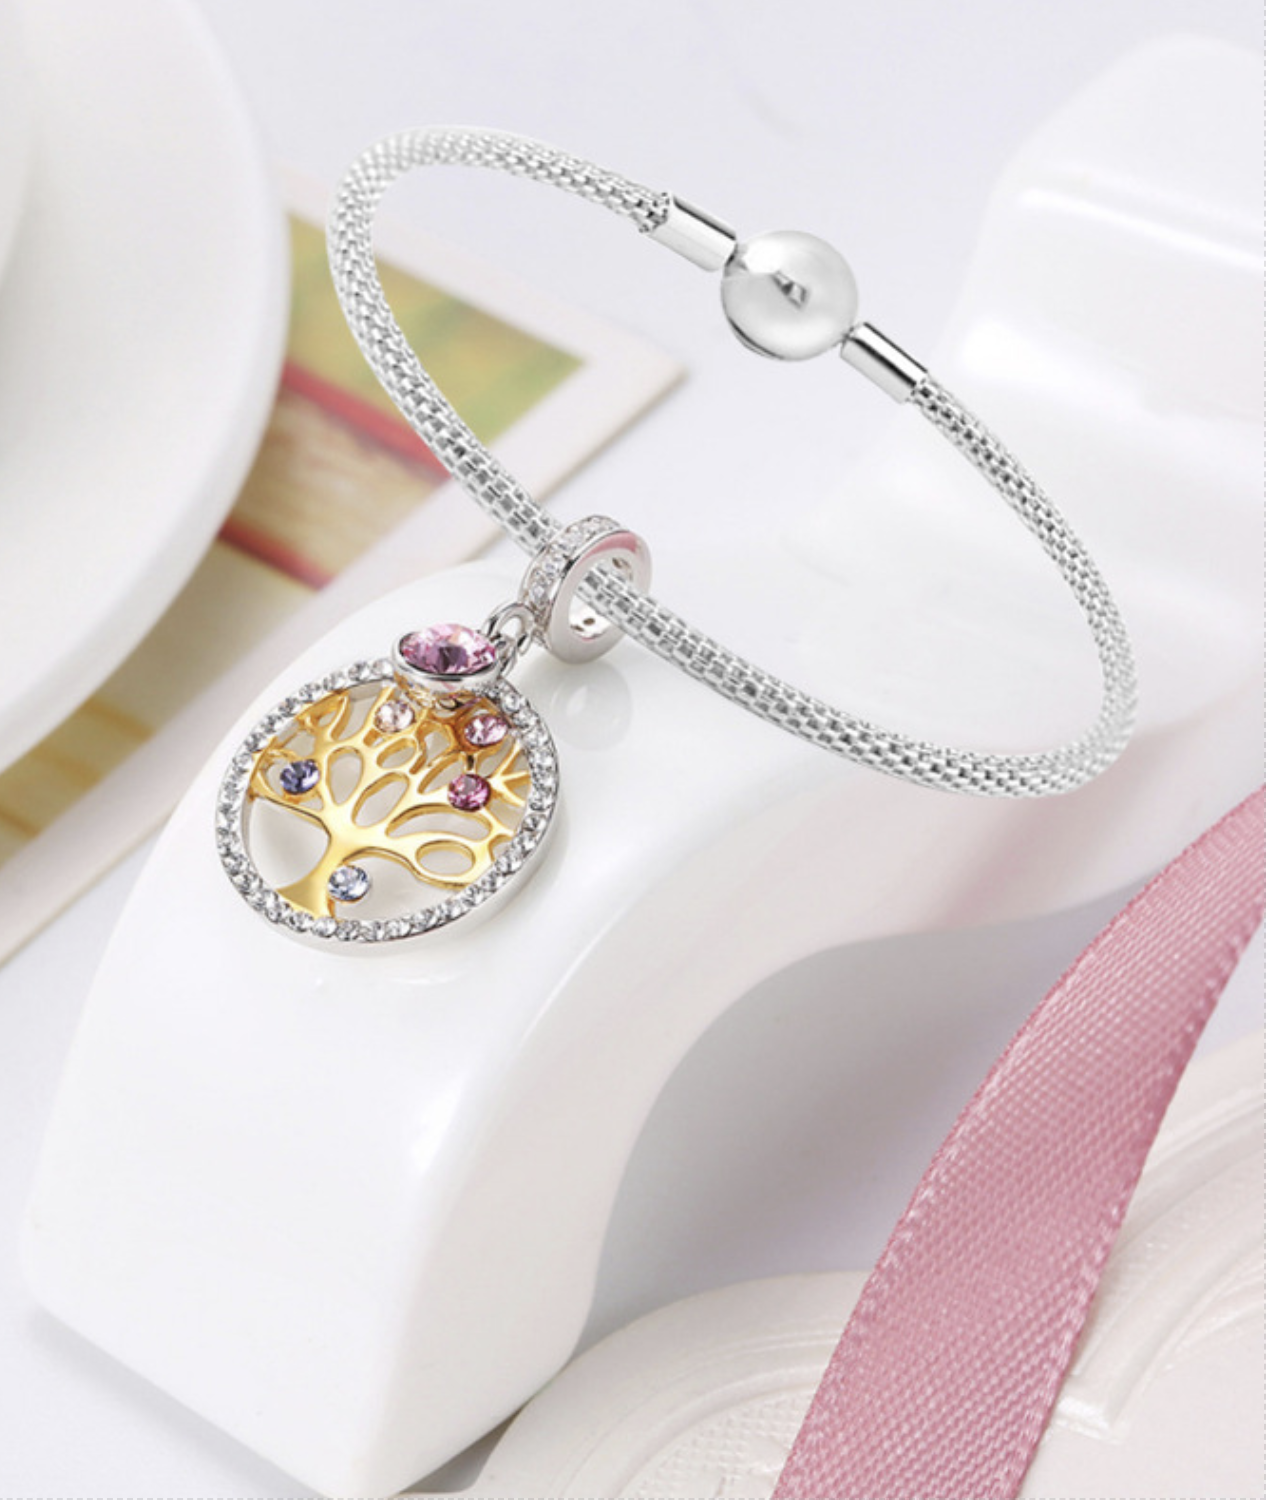 pendentif pour bracelet pandora